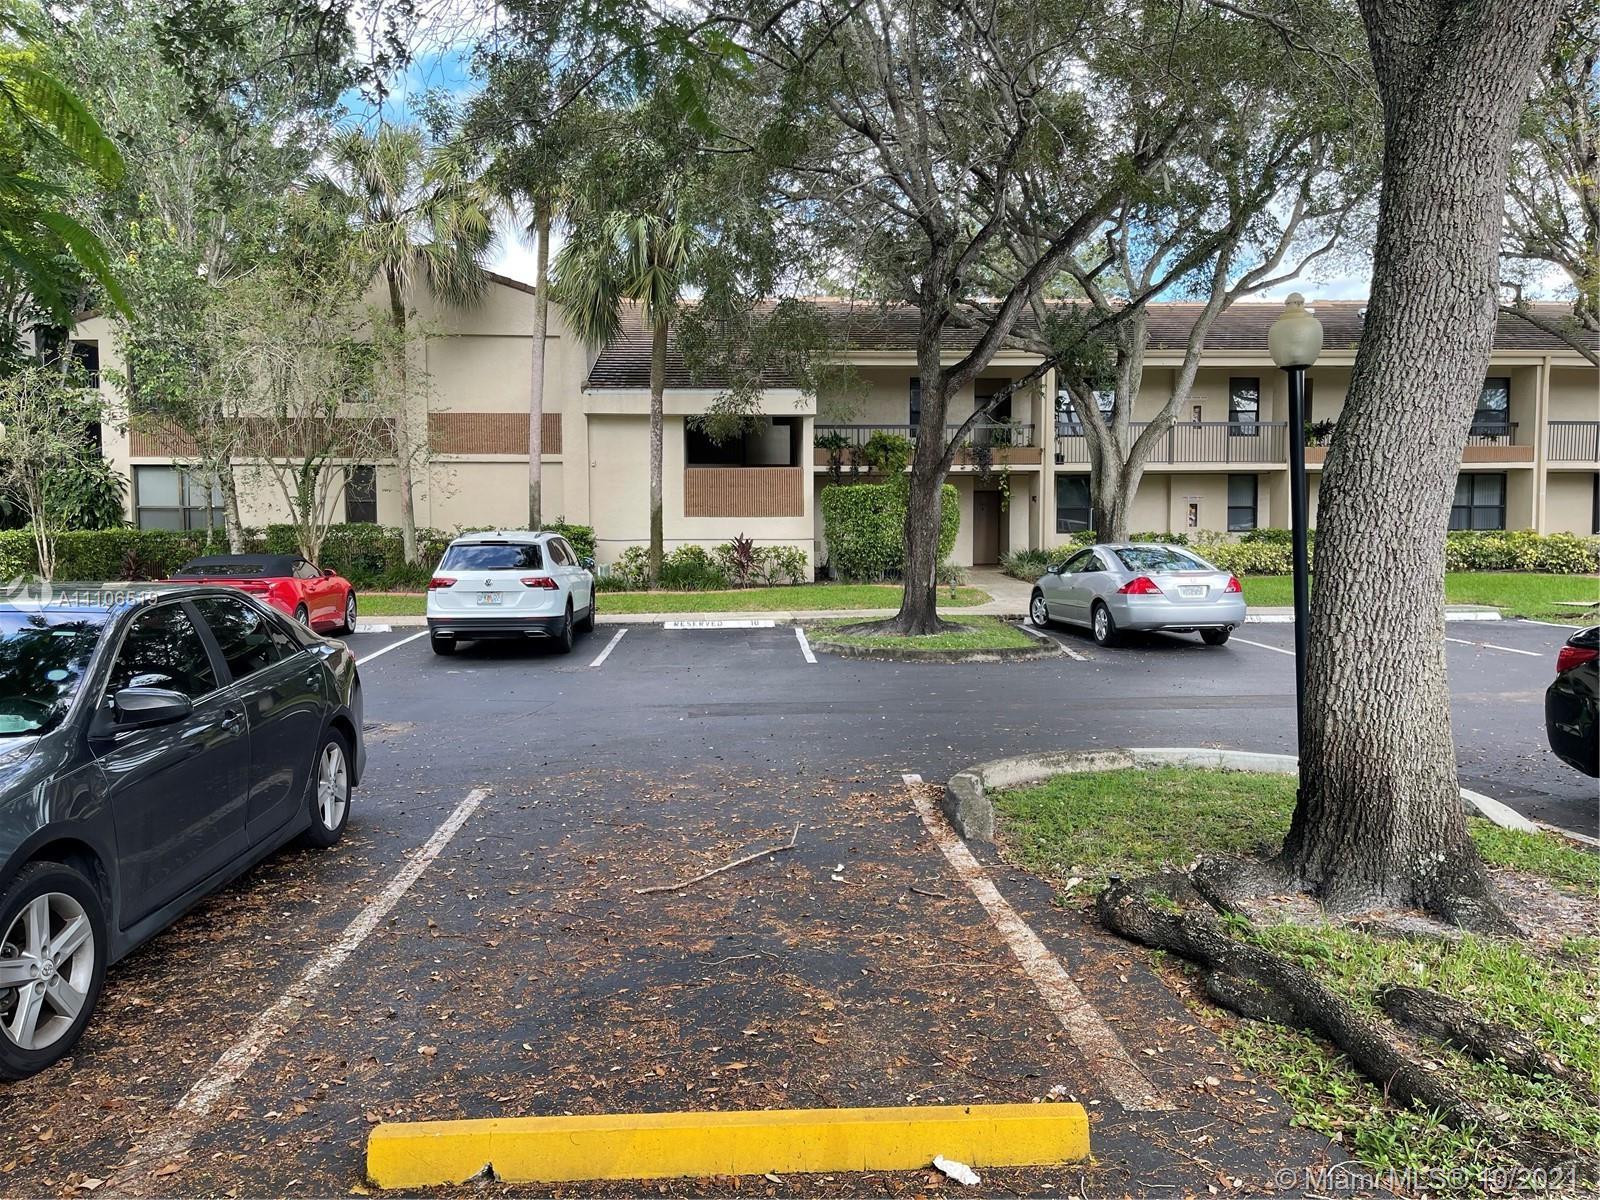 40 76th Ave Unit 101-1, Plantation, Florida 33324